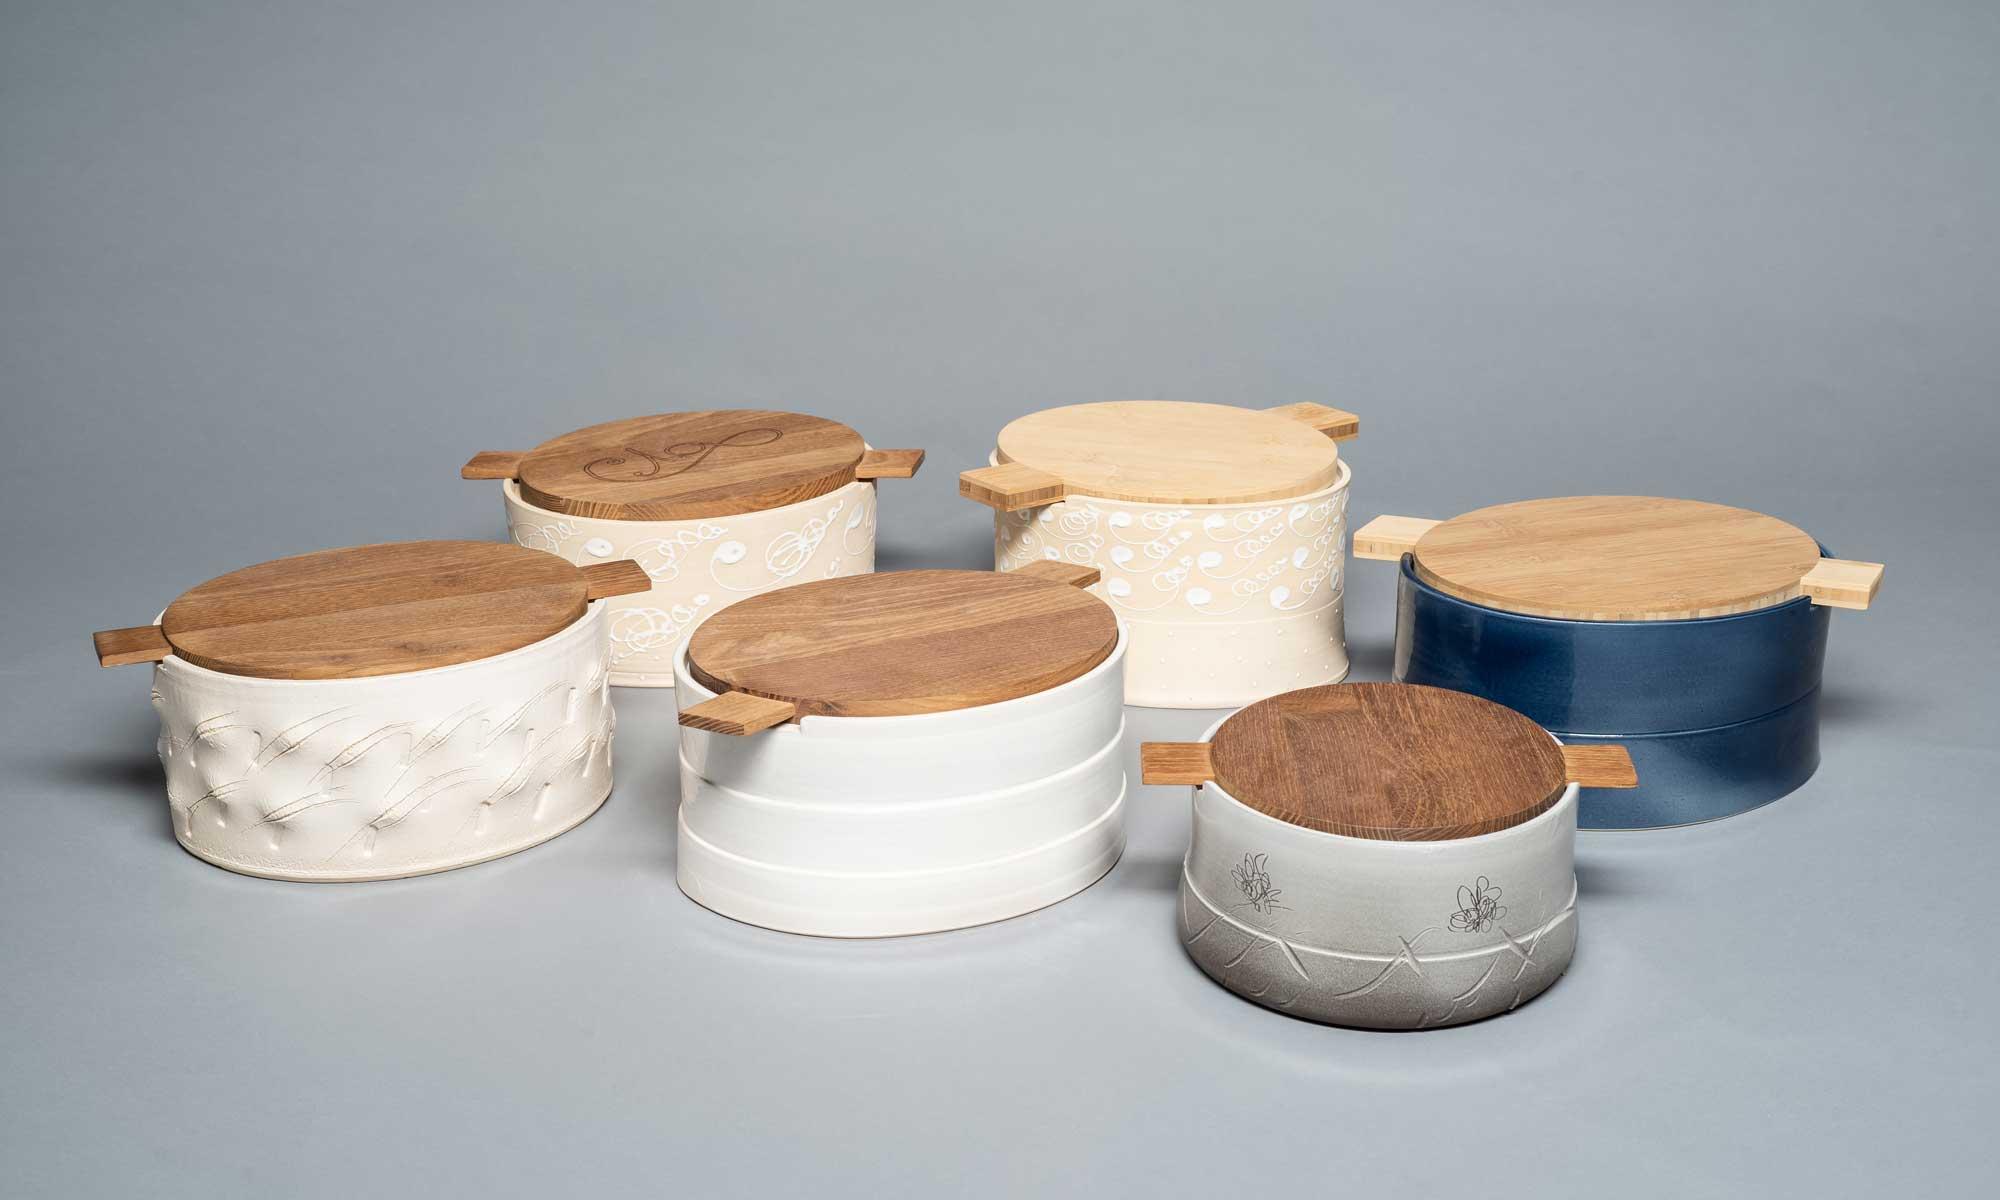 Brotdose, Renate Mehlmauer, Keramik, Kunst, Künstlerin